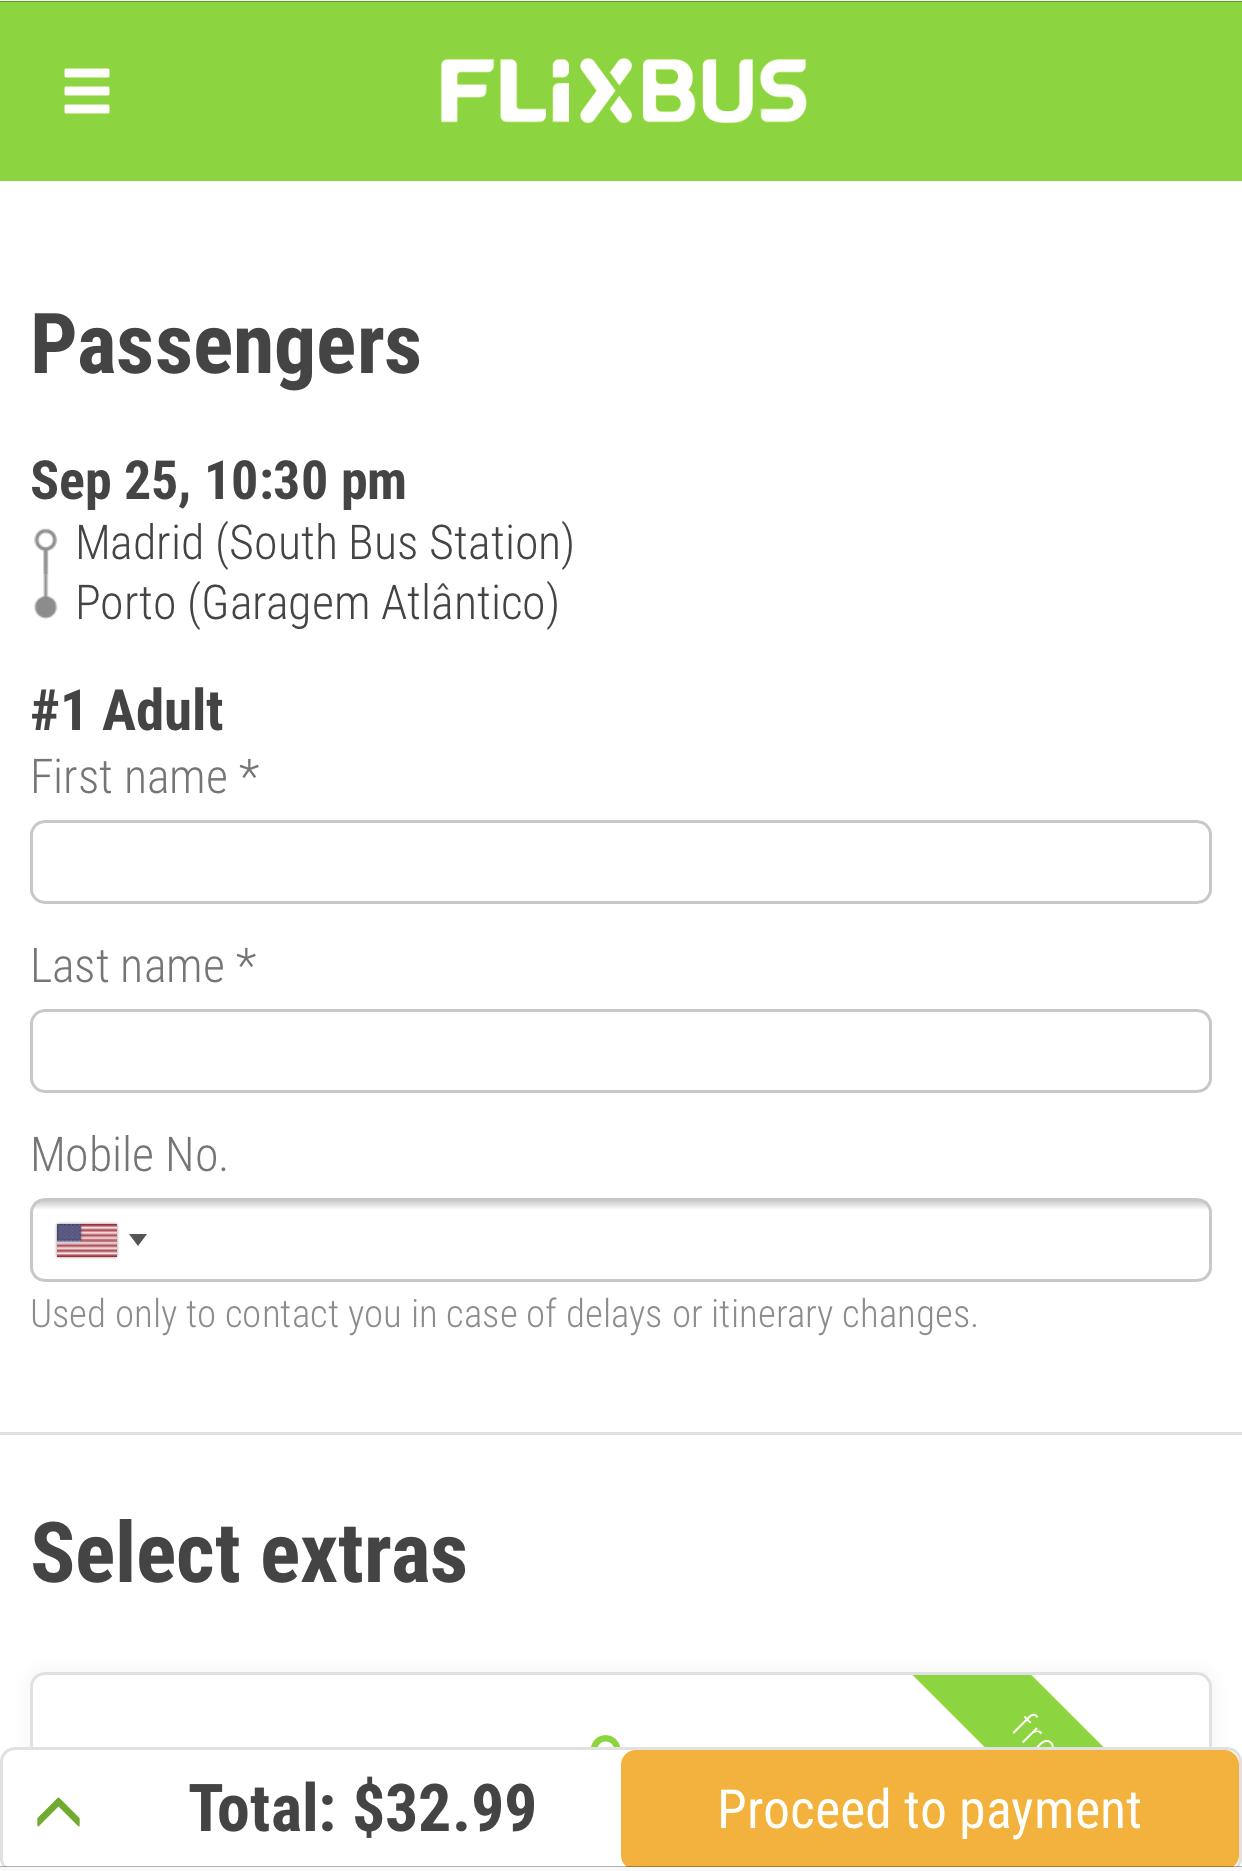 FlixBusの予約の仕方|詳細情報の入力